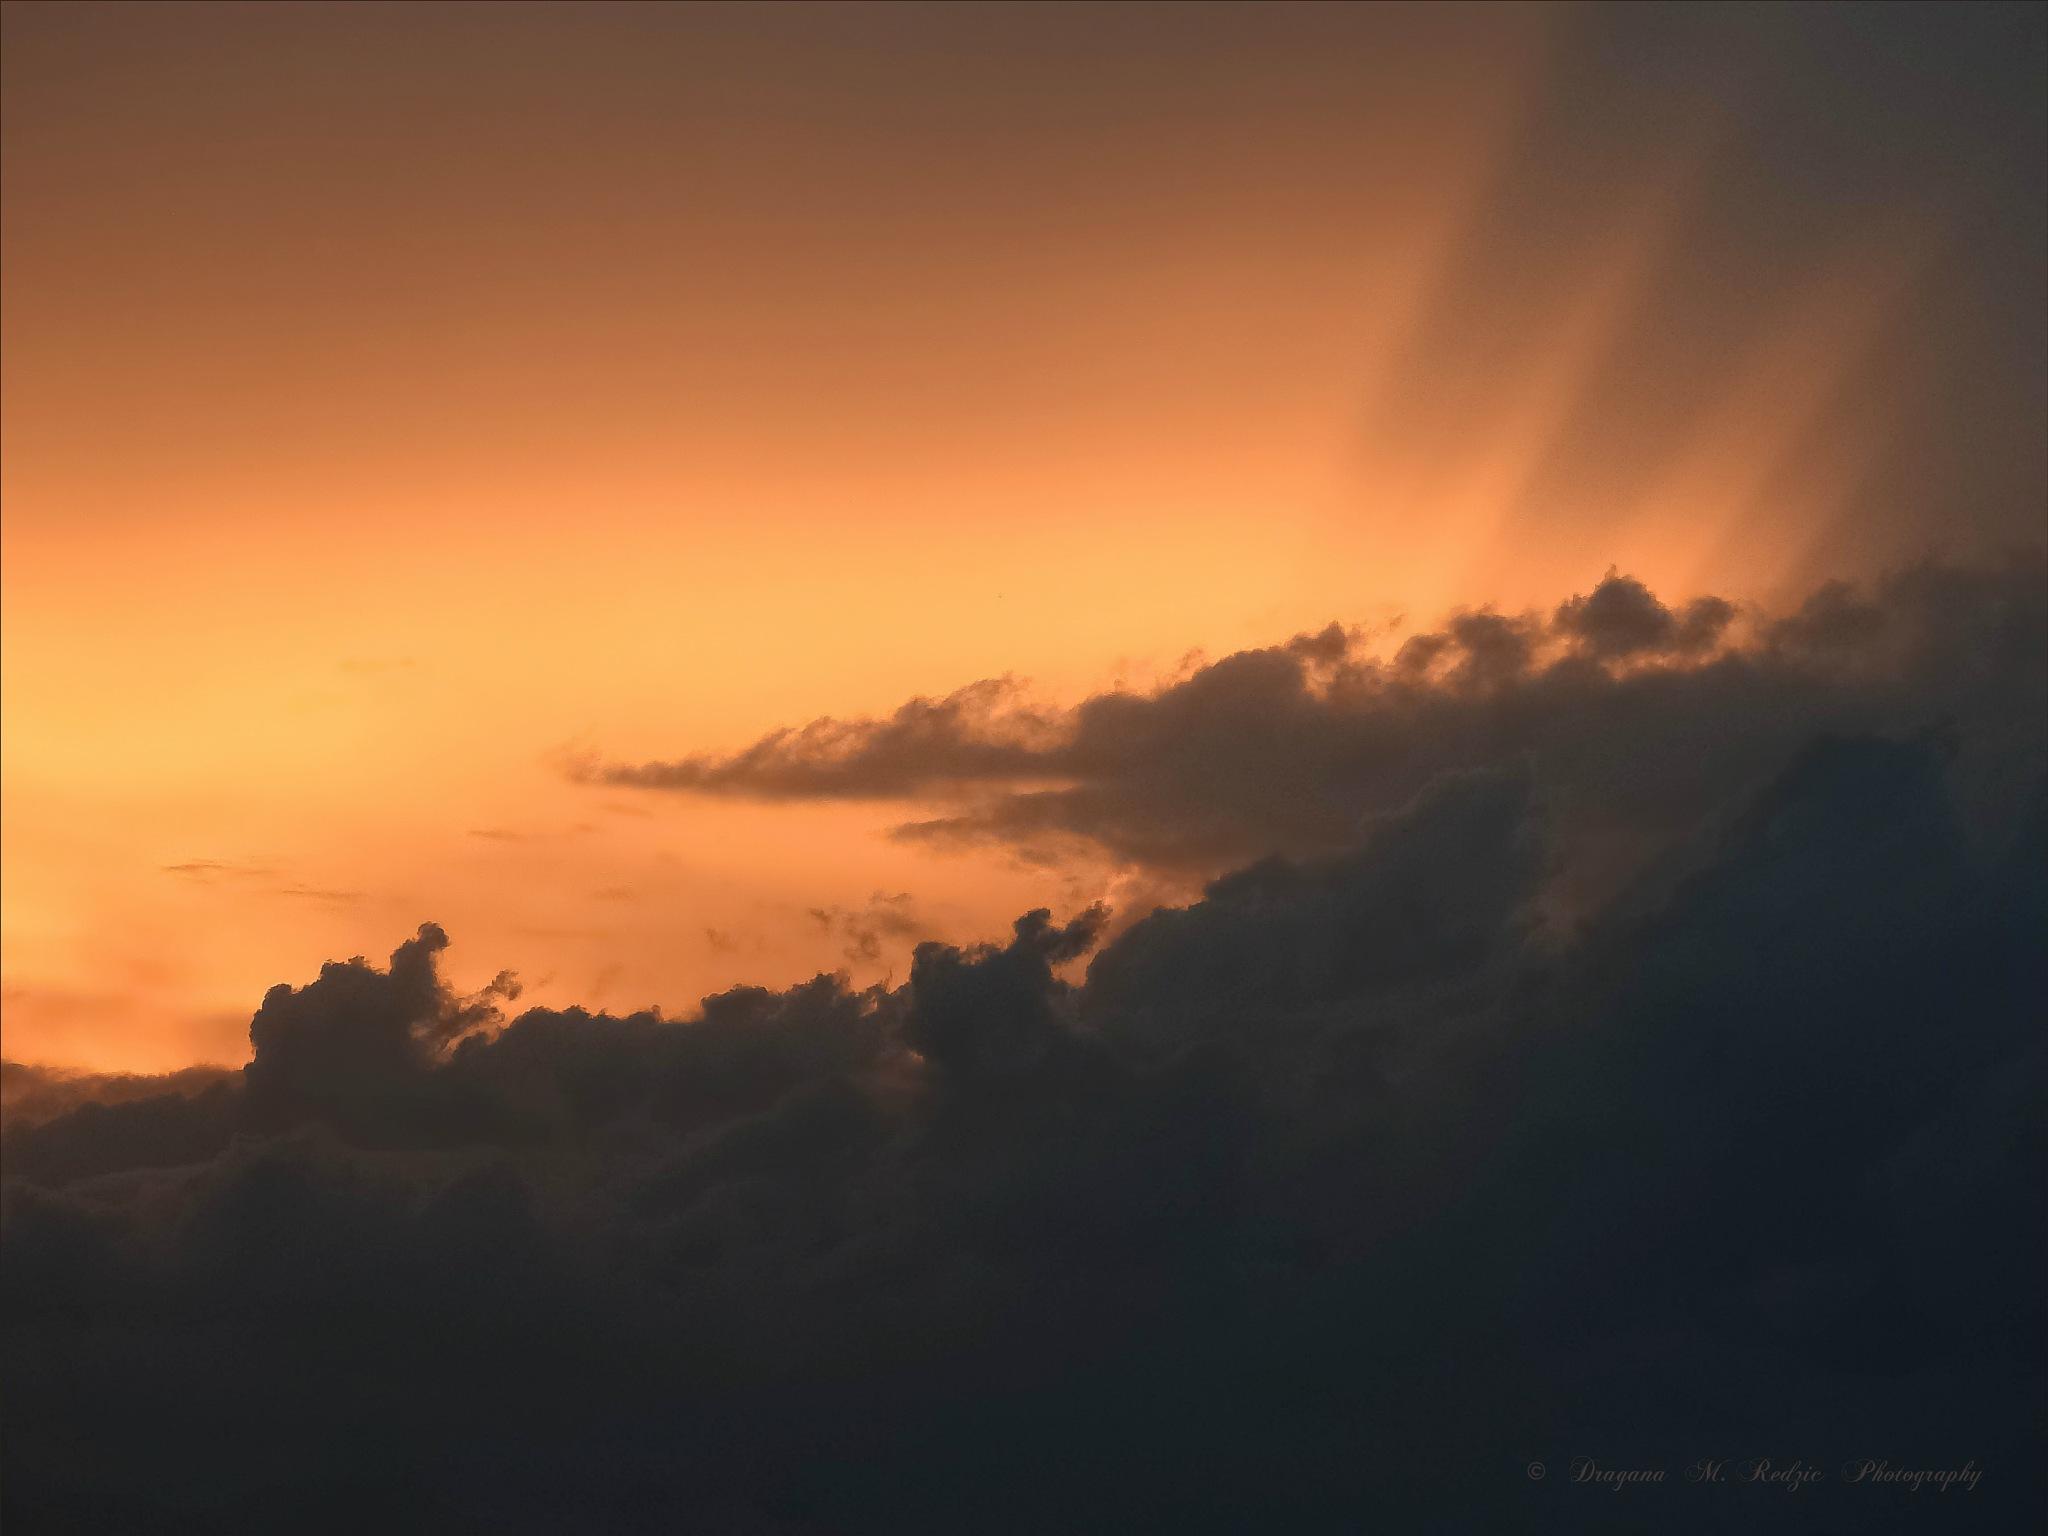 Cloudy dusk by Драгана М. Реџић